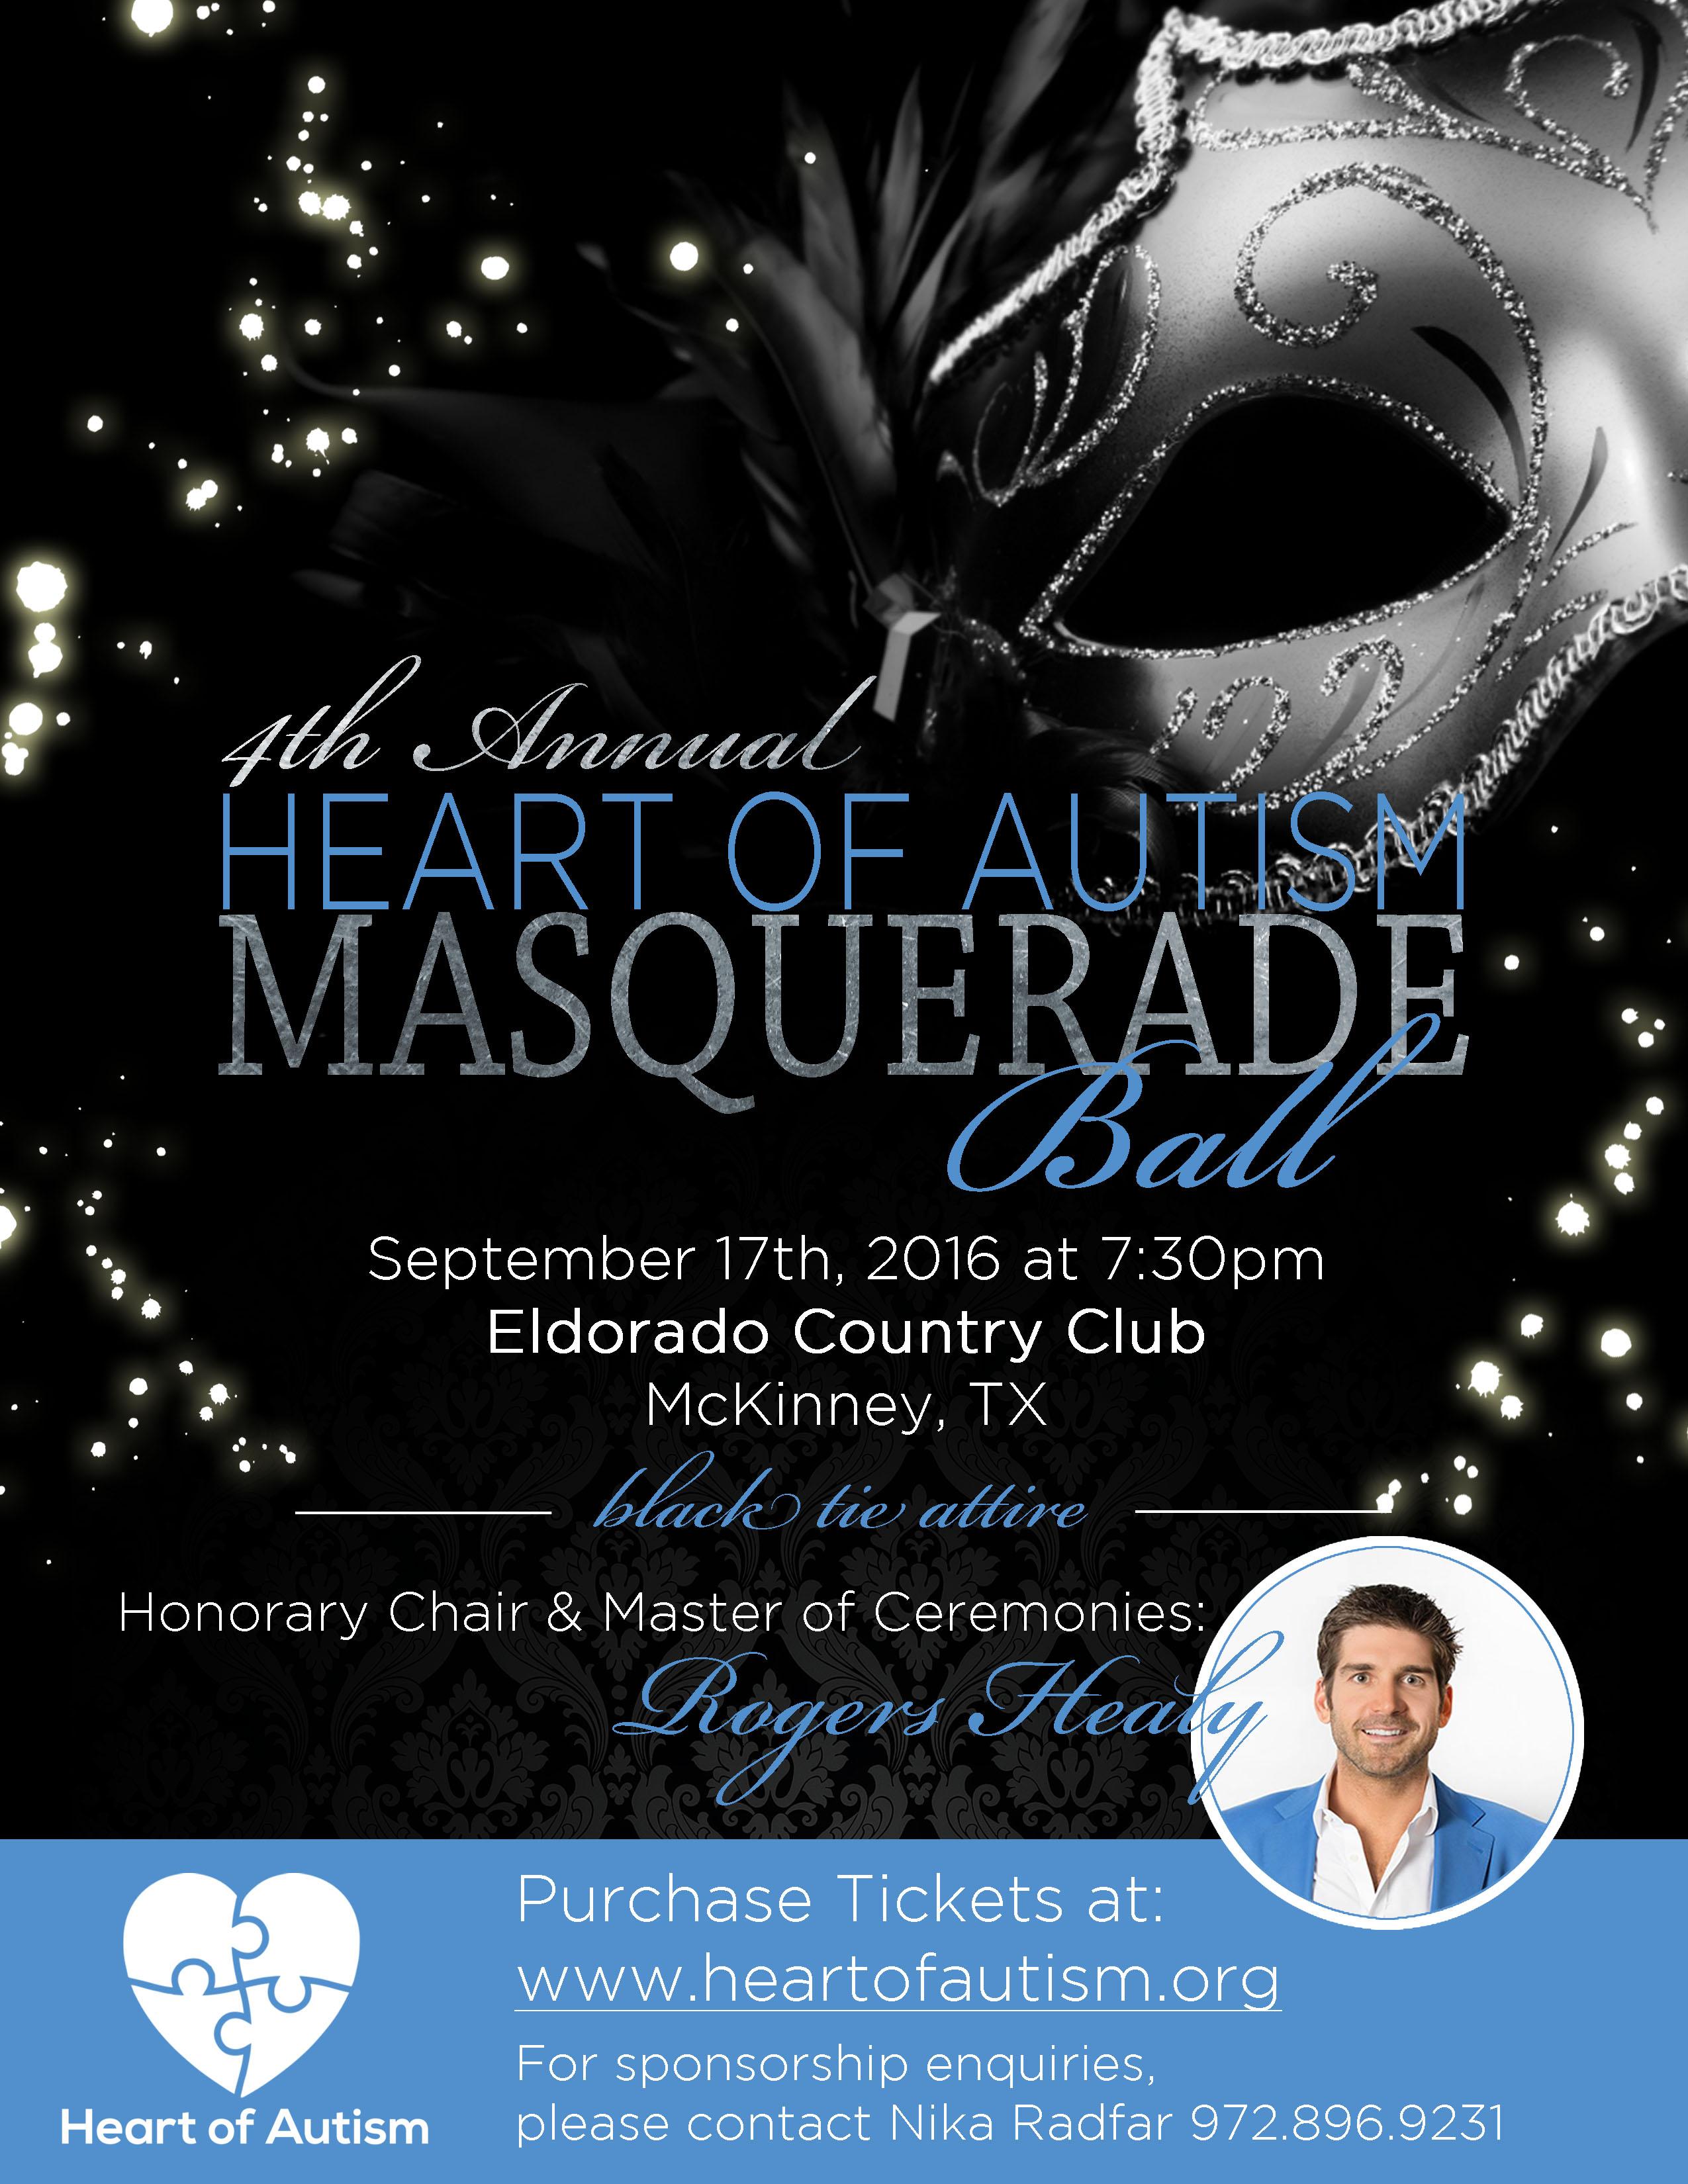 Heart of Autism 2016 Masquerade Ball